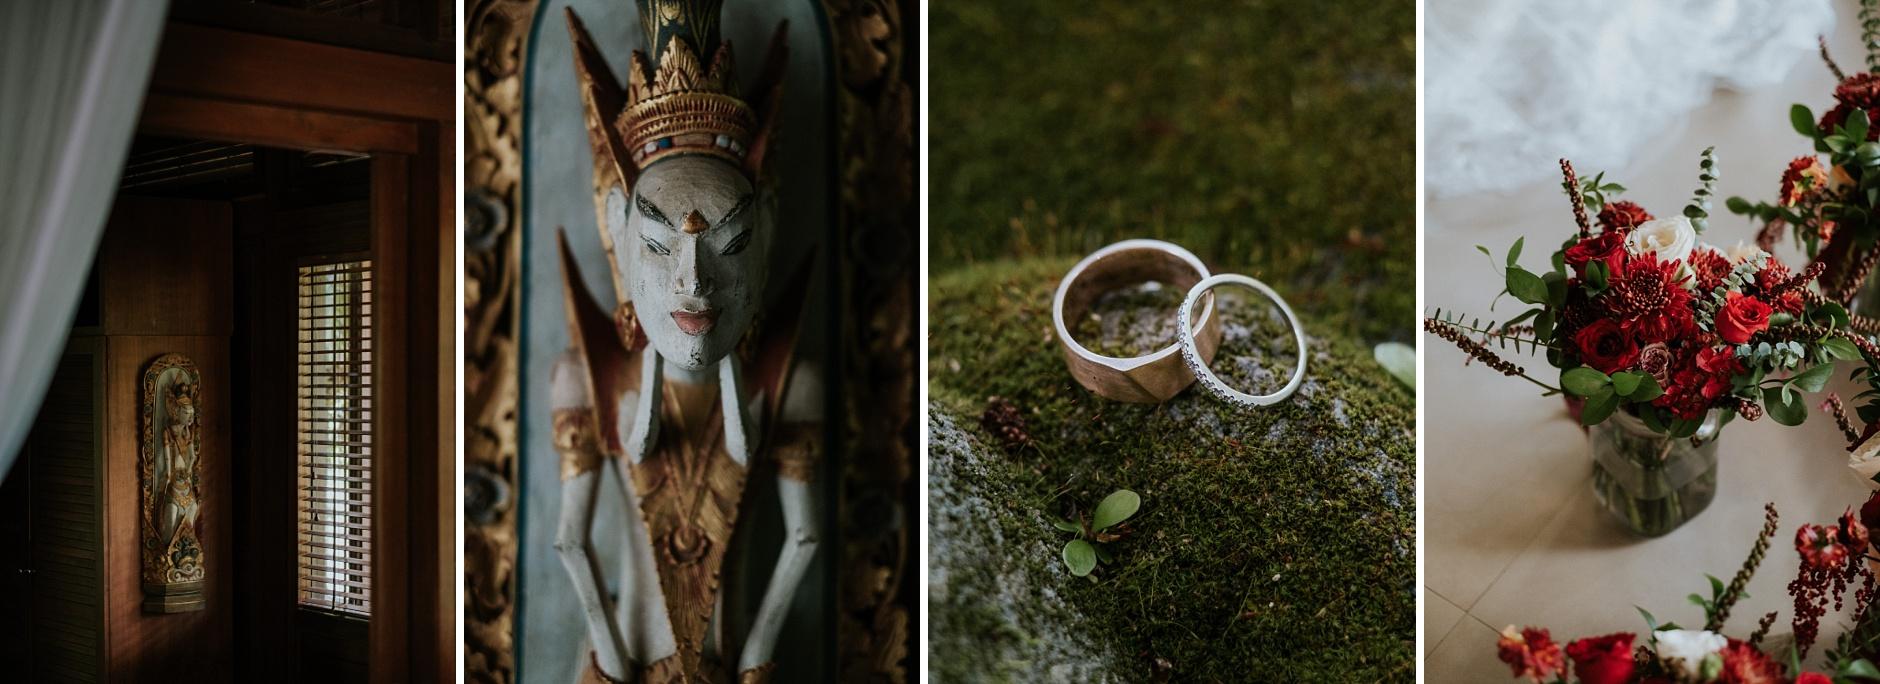 breanna&dan0092a_Bali-Wedding-Photographer-1b.jpg